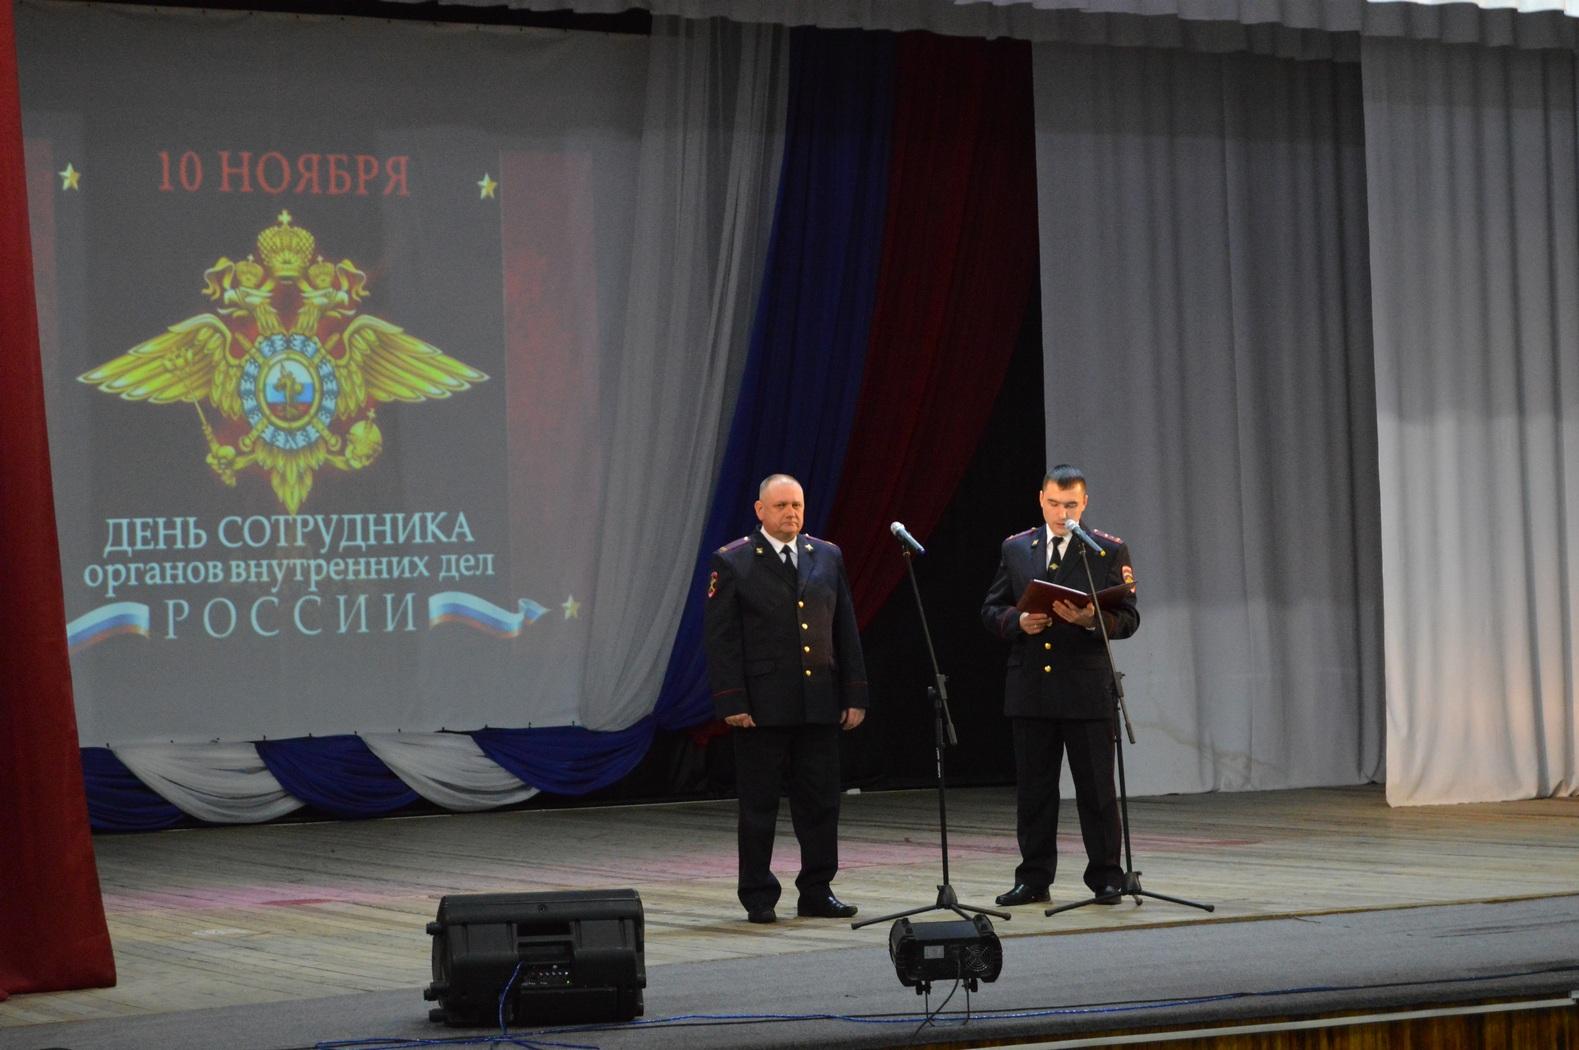 Фото Е. Саркисовой